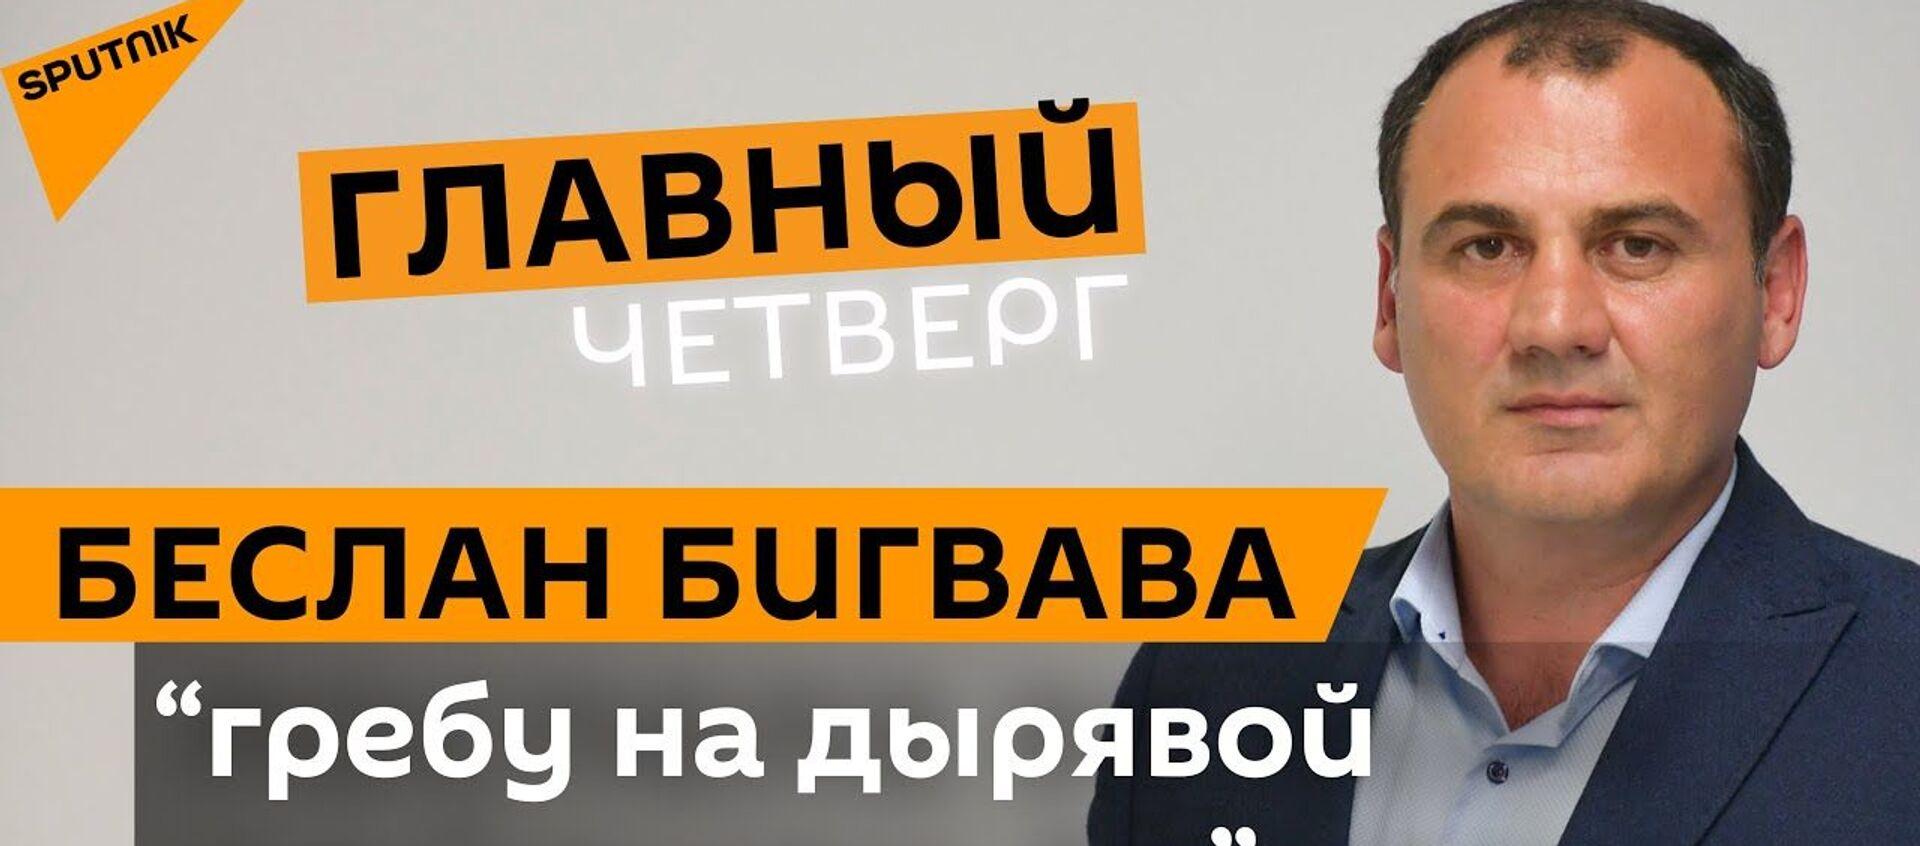 Беслан Бигвава: плыву на дырявой лодке до конца - Sputnik Абхазия, 1920, 02.09.2021